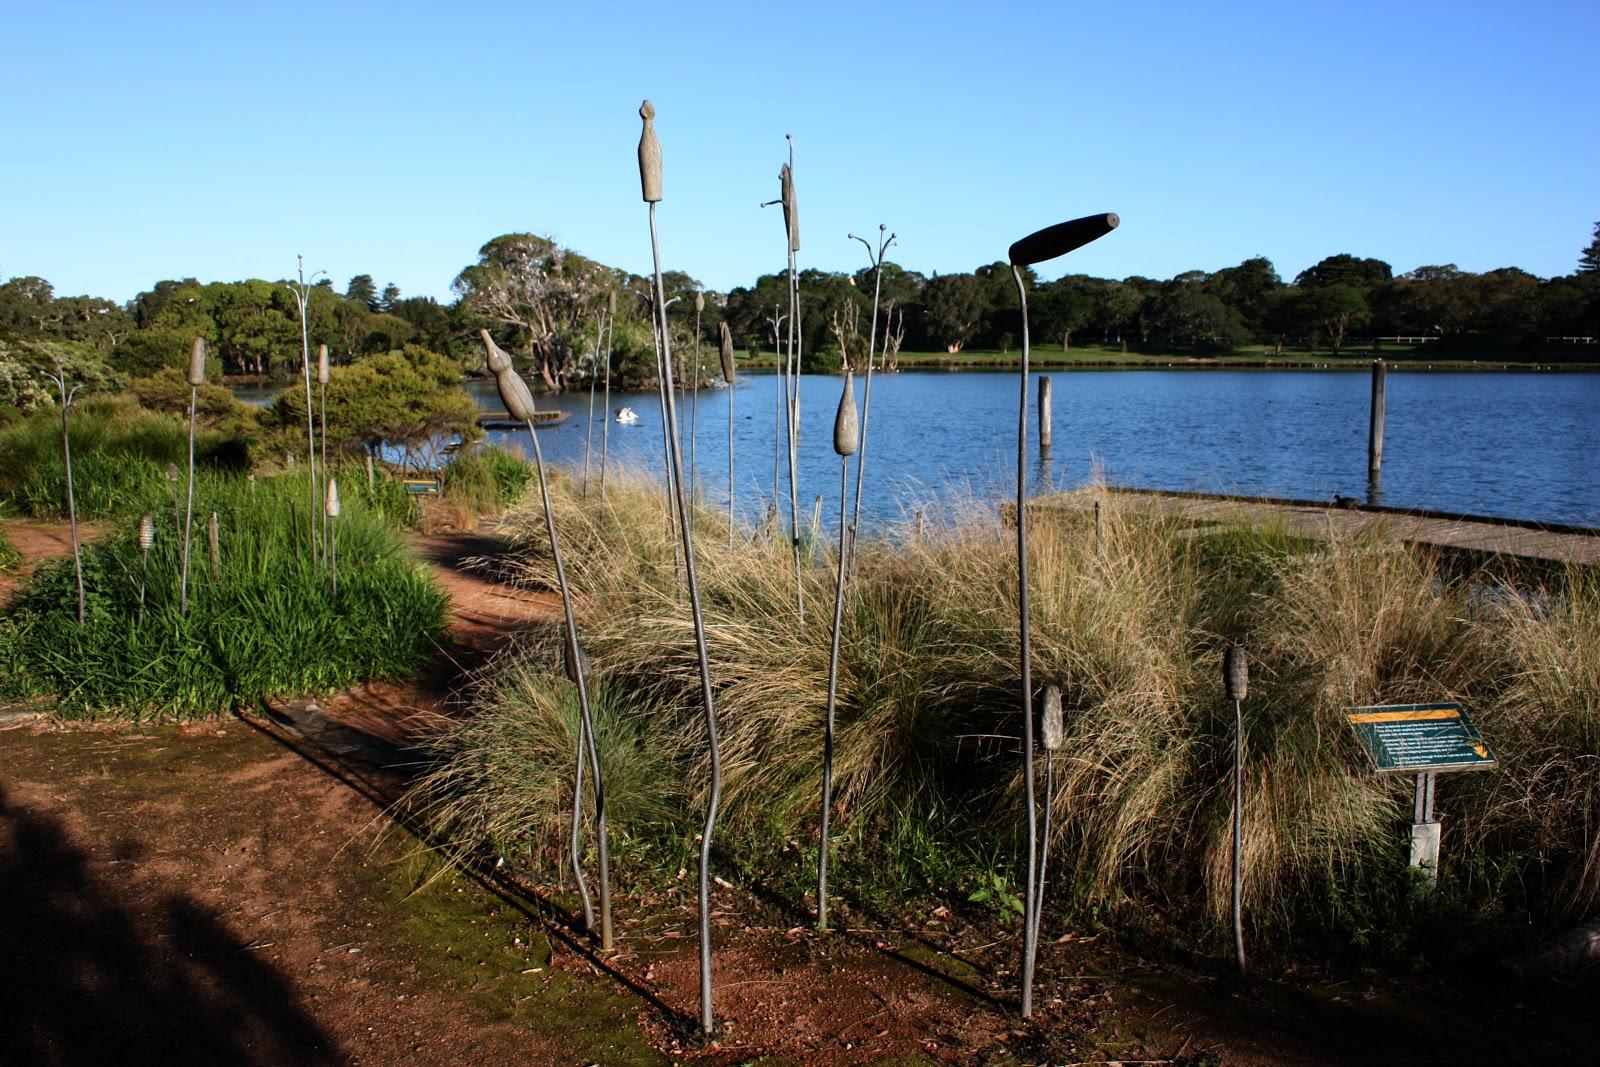 Sydney - City and Suburbs: Centennial Park, sculpture